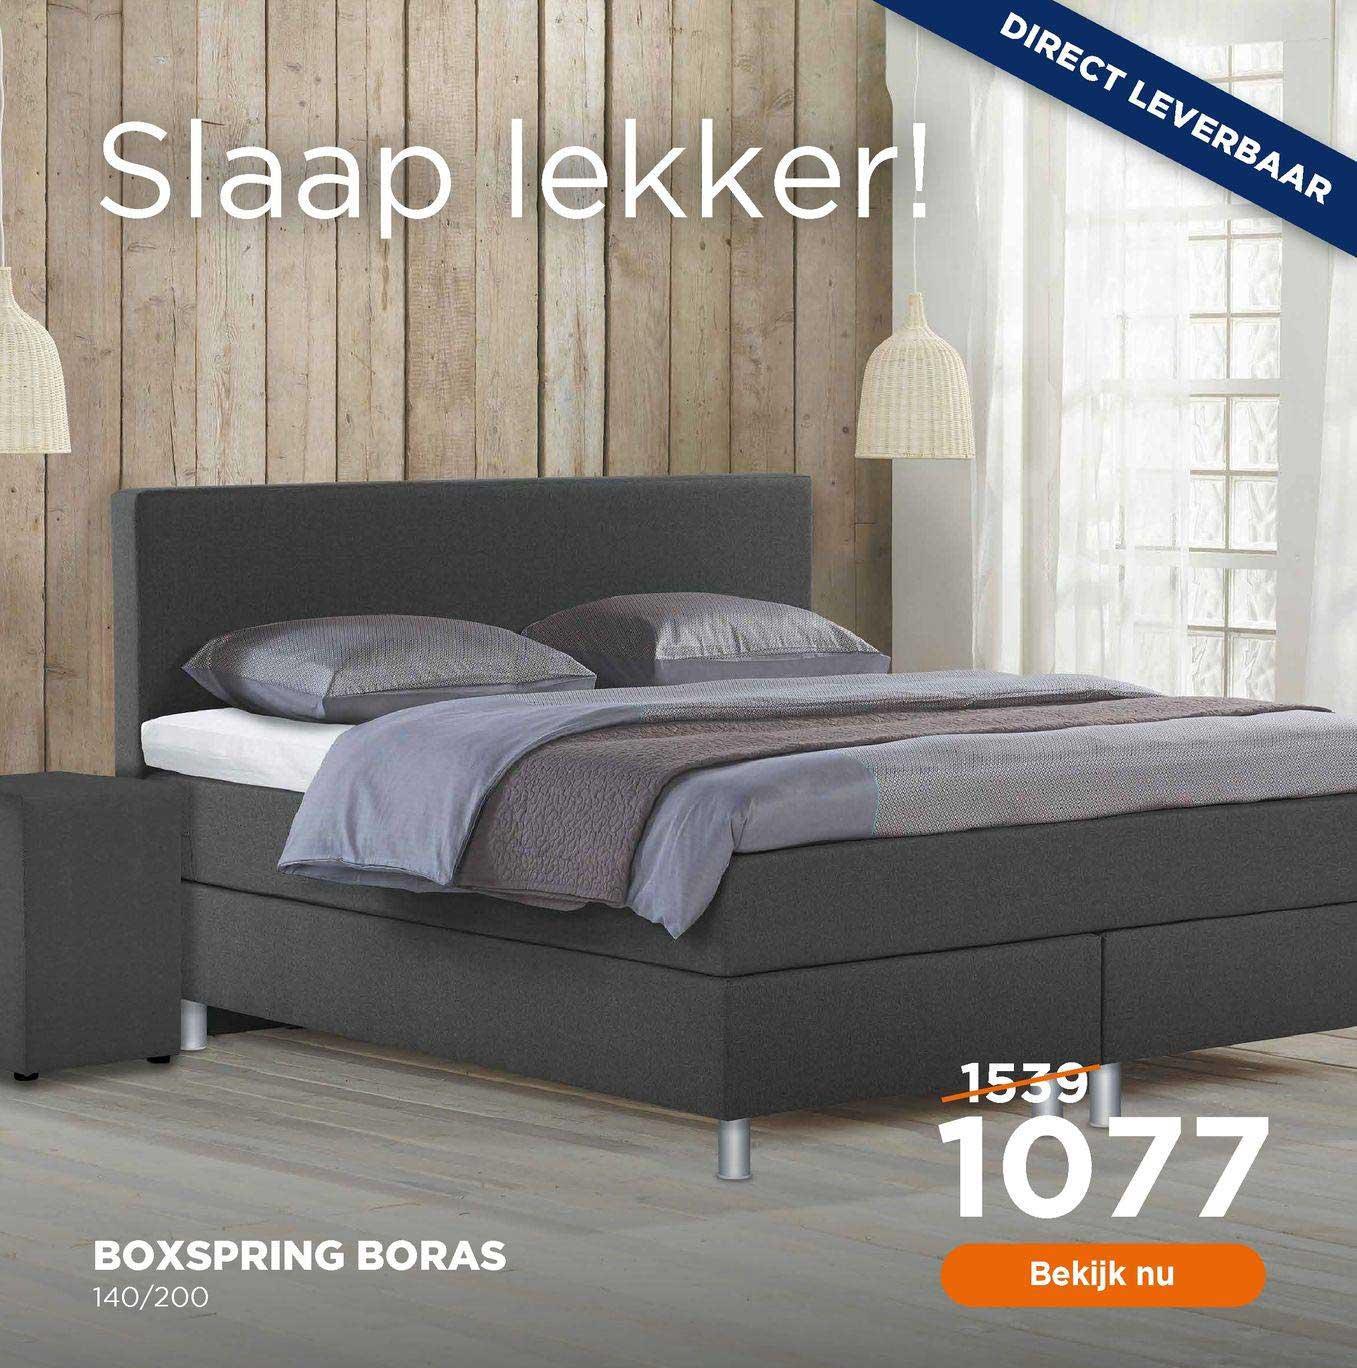 TotaalBED Boxspring Boras 140-200